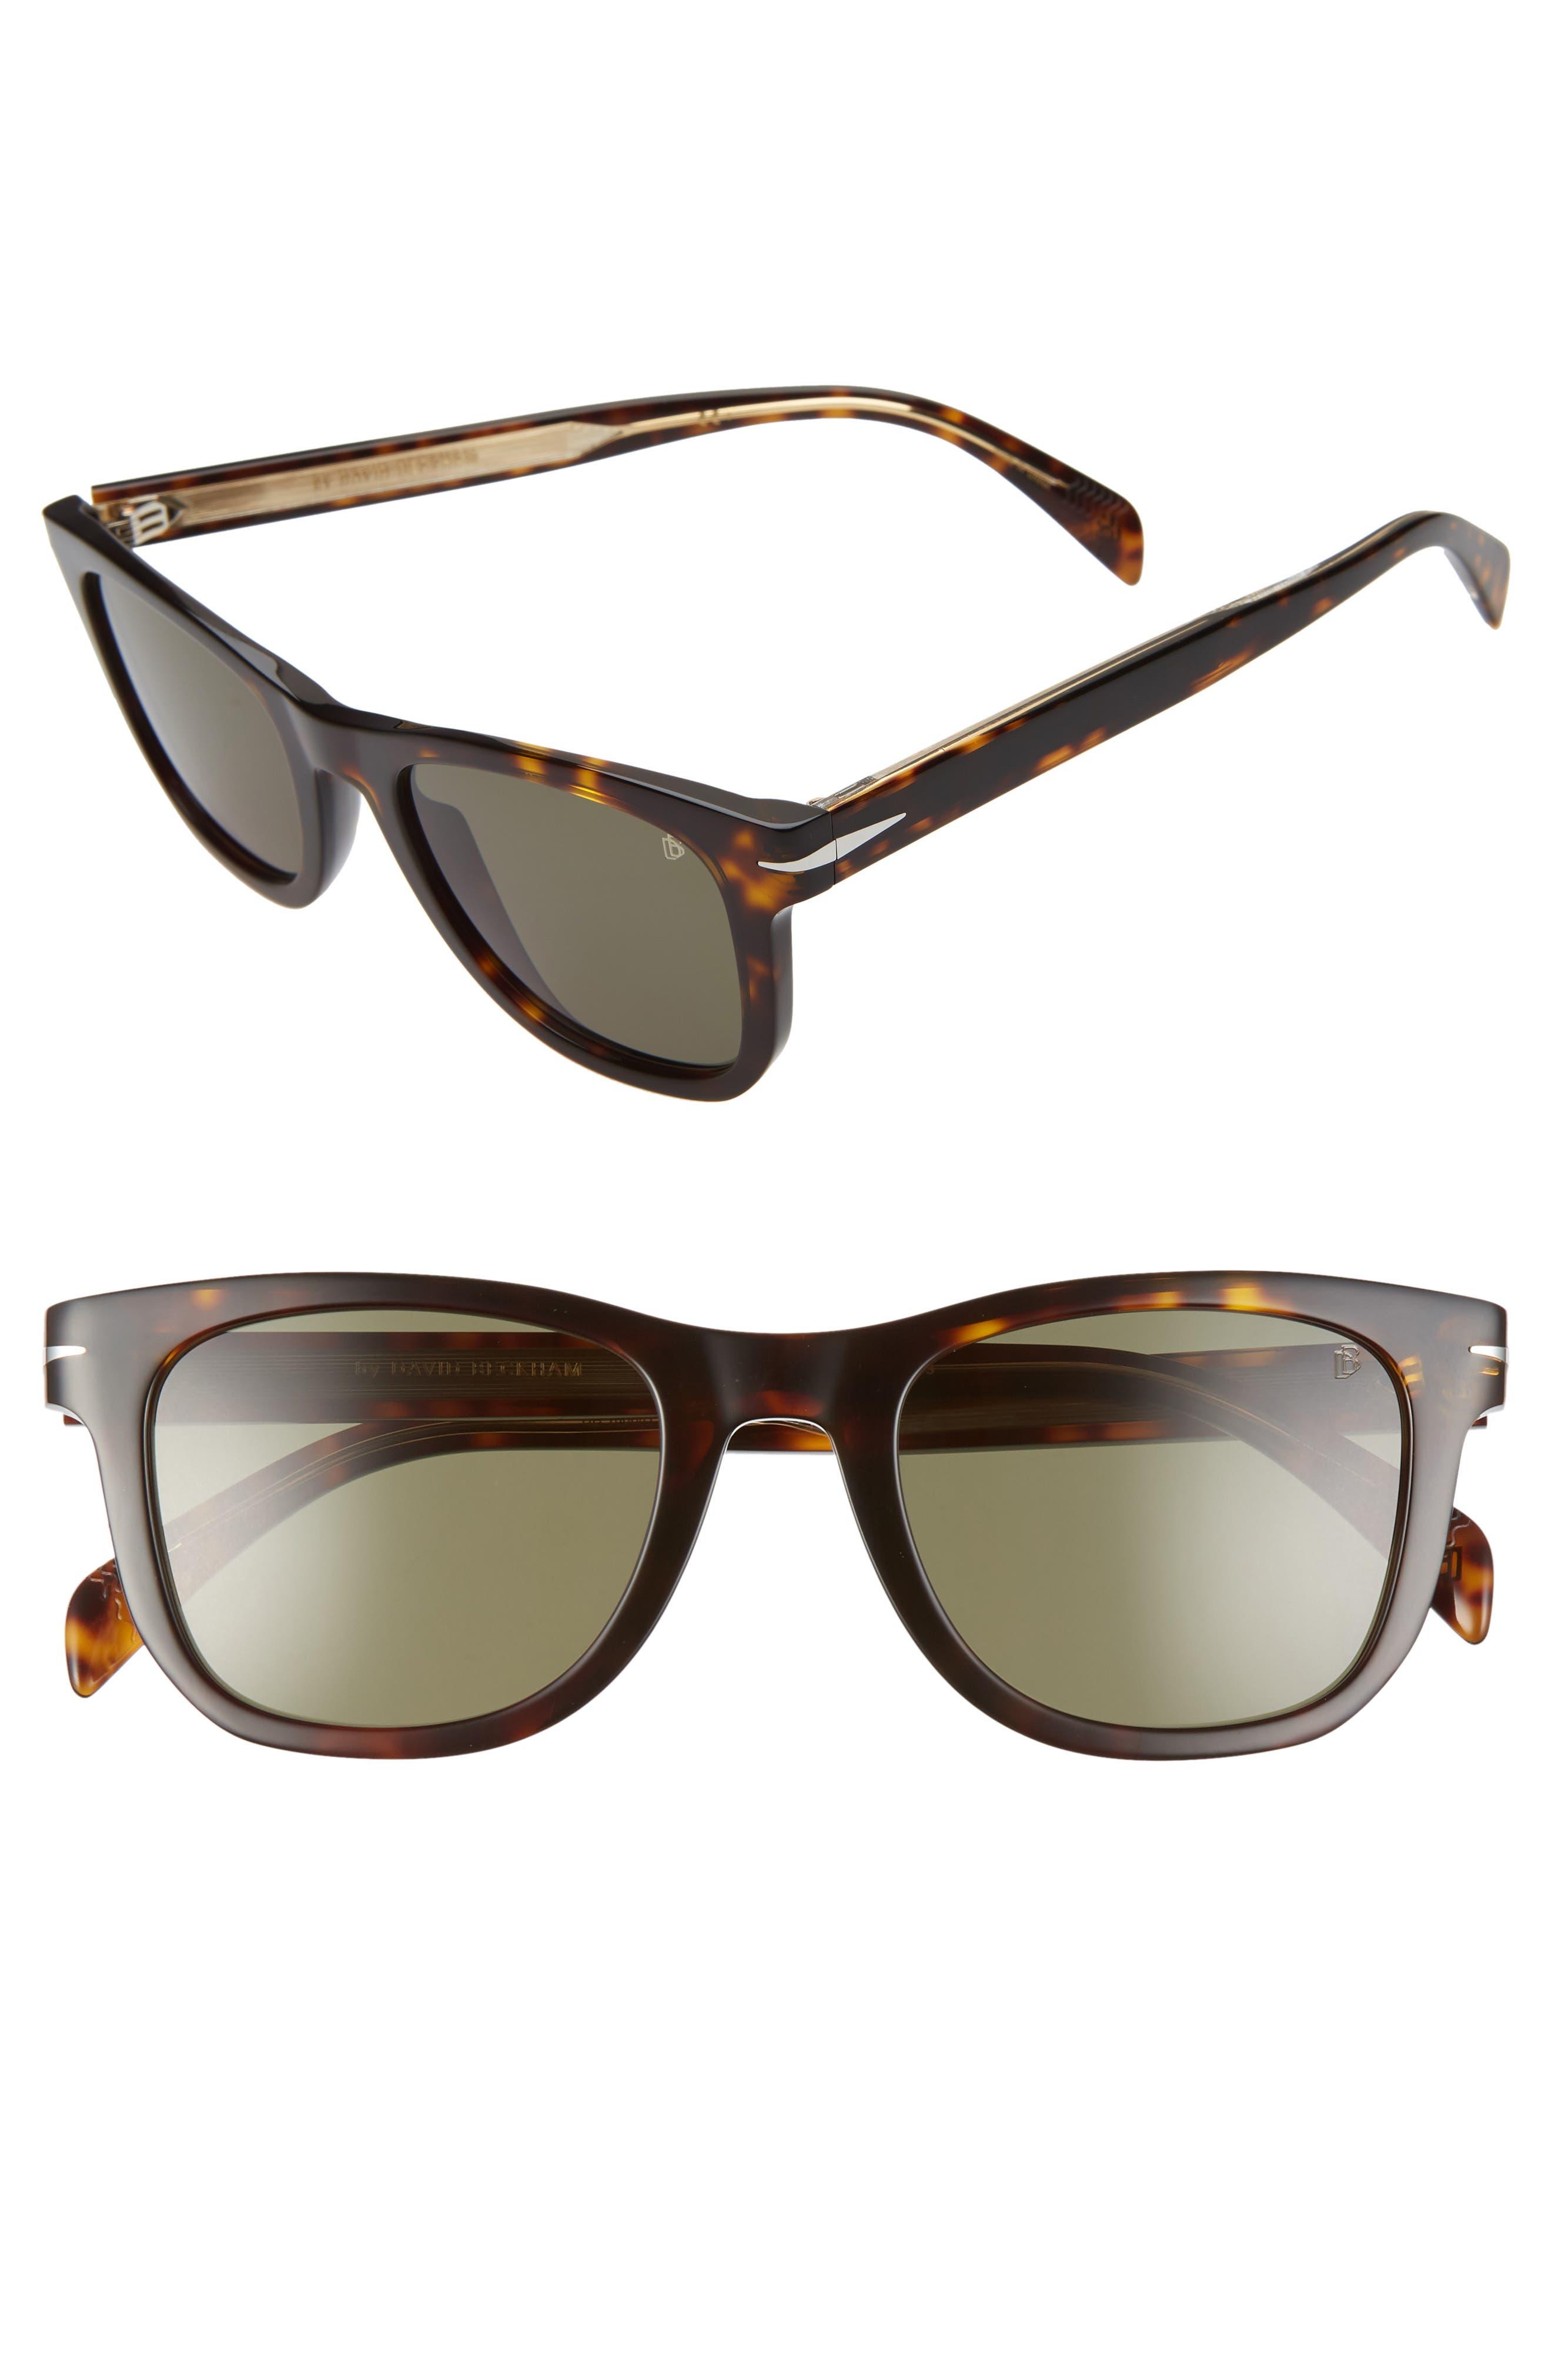 Men's Eyewear By David Beckham Db1006/s 50mm Sunglasses